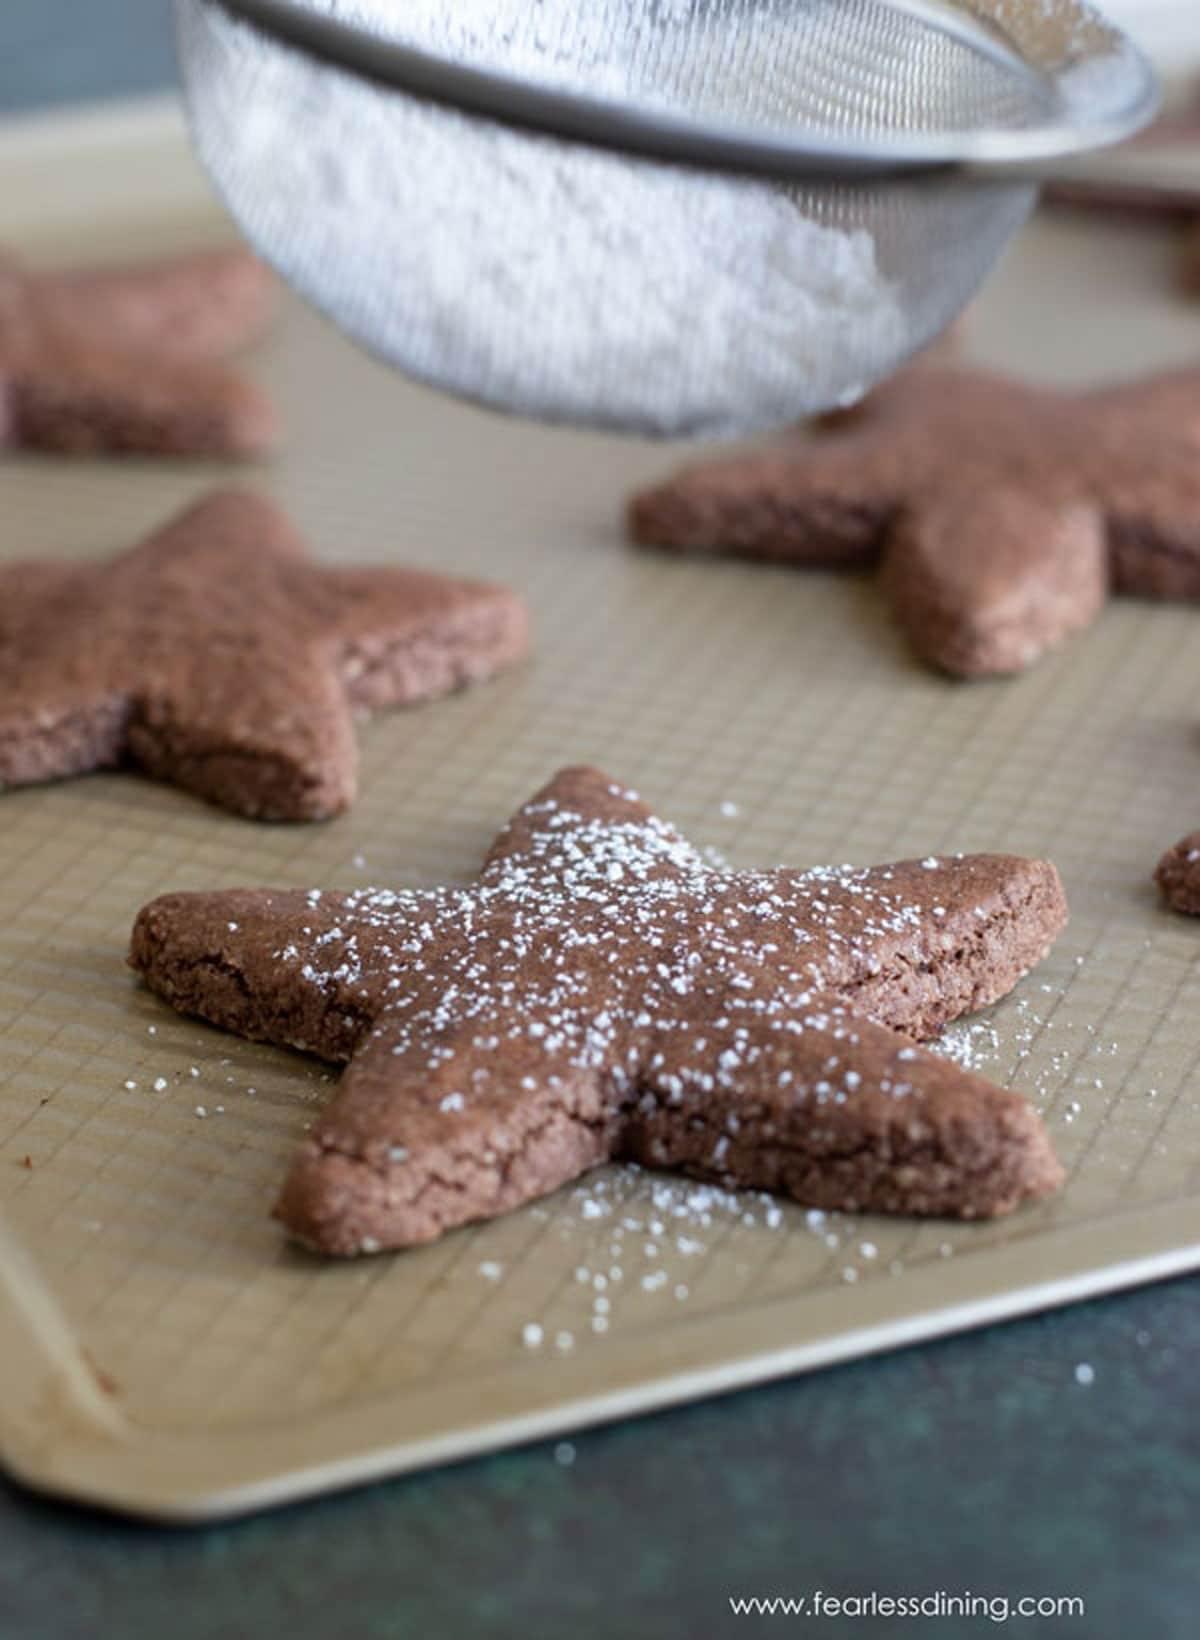 dusting cookies with powdered sugar